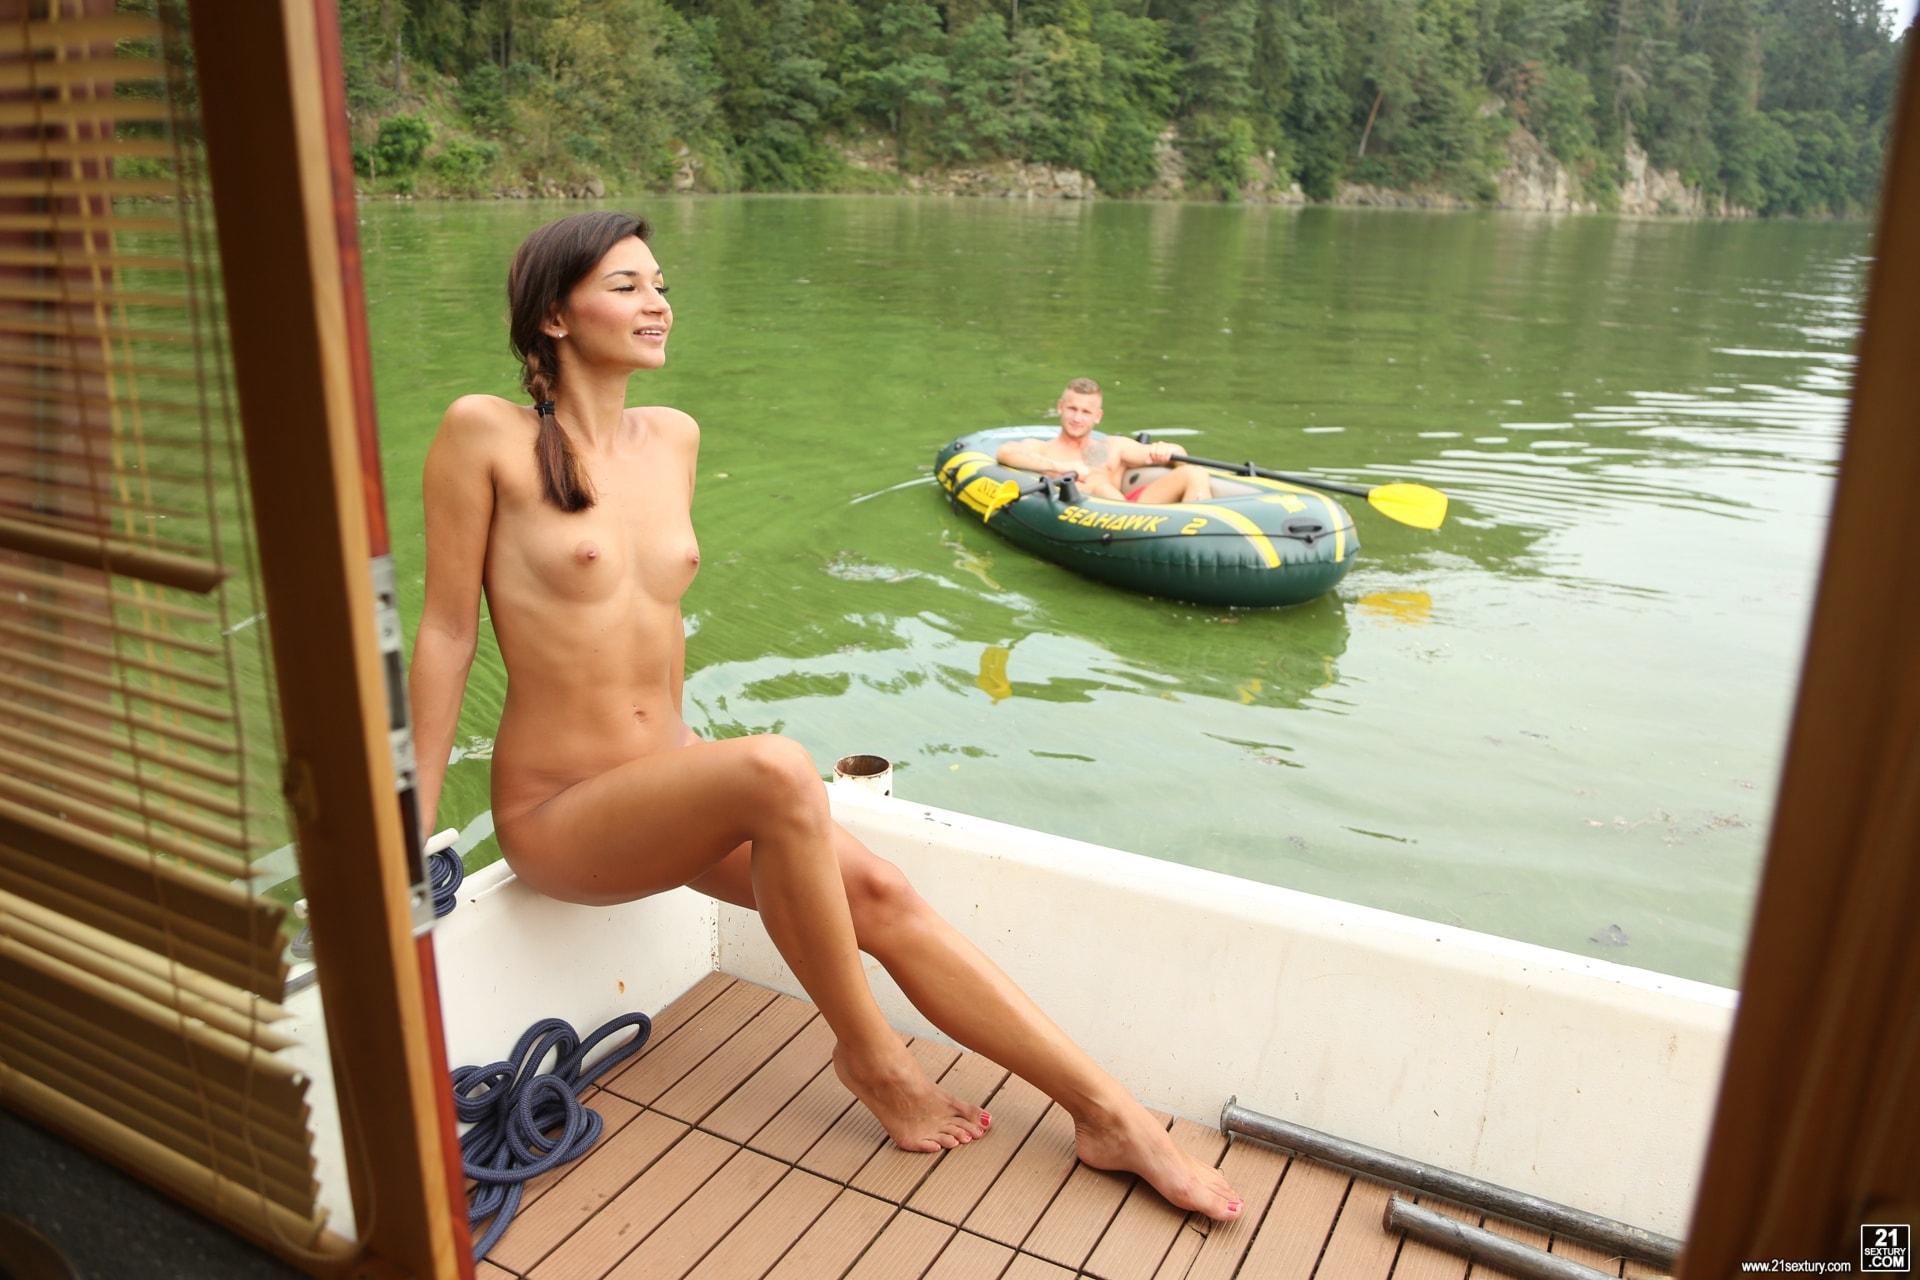 21Sextury 'No Tan Lines' starring Adela (Photo 4)